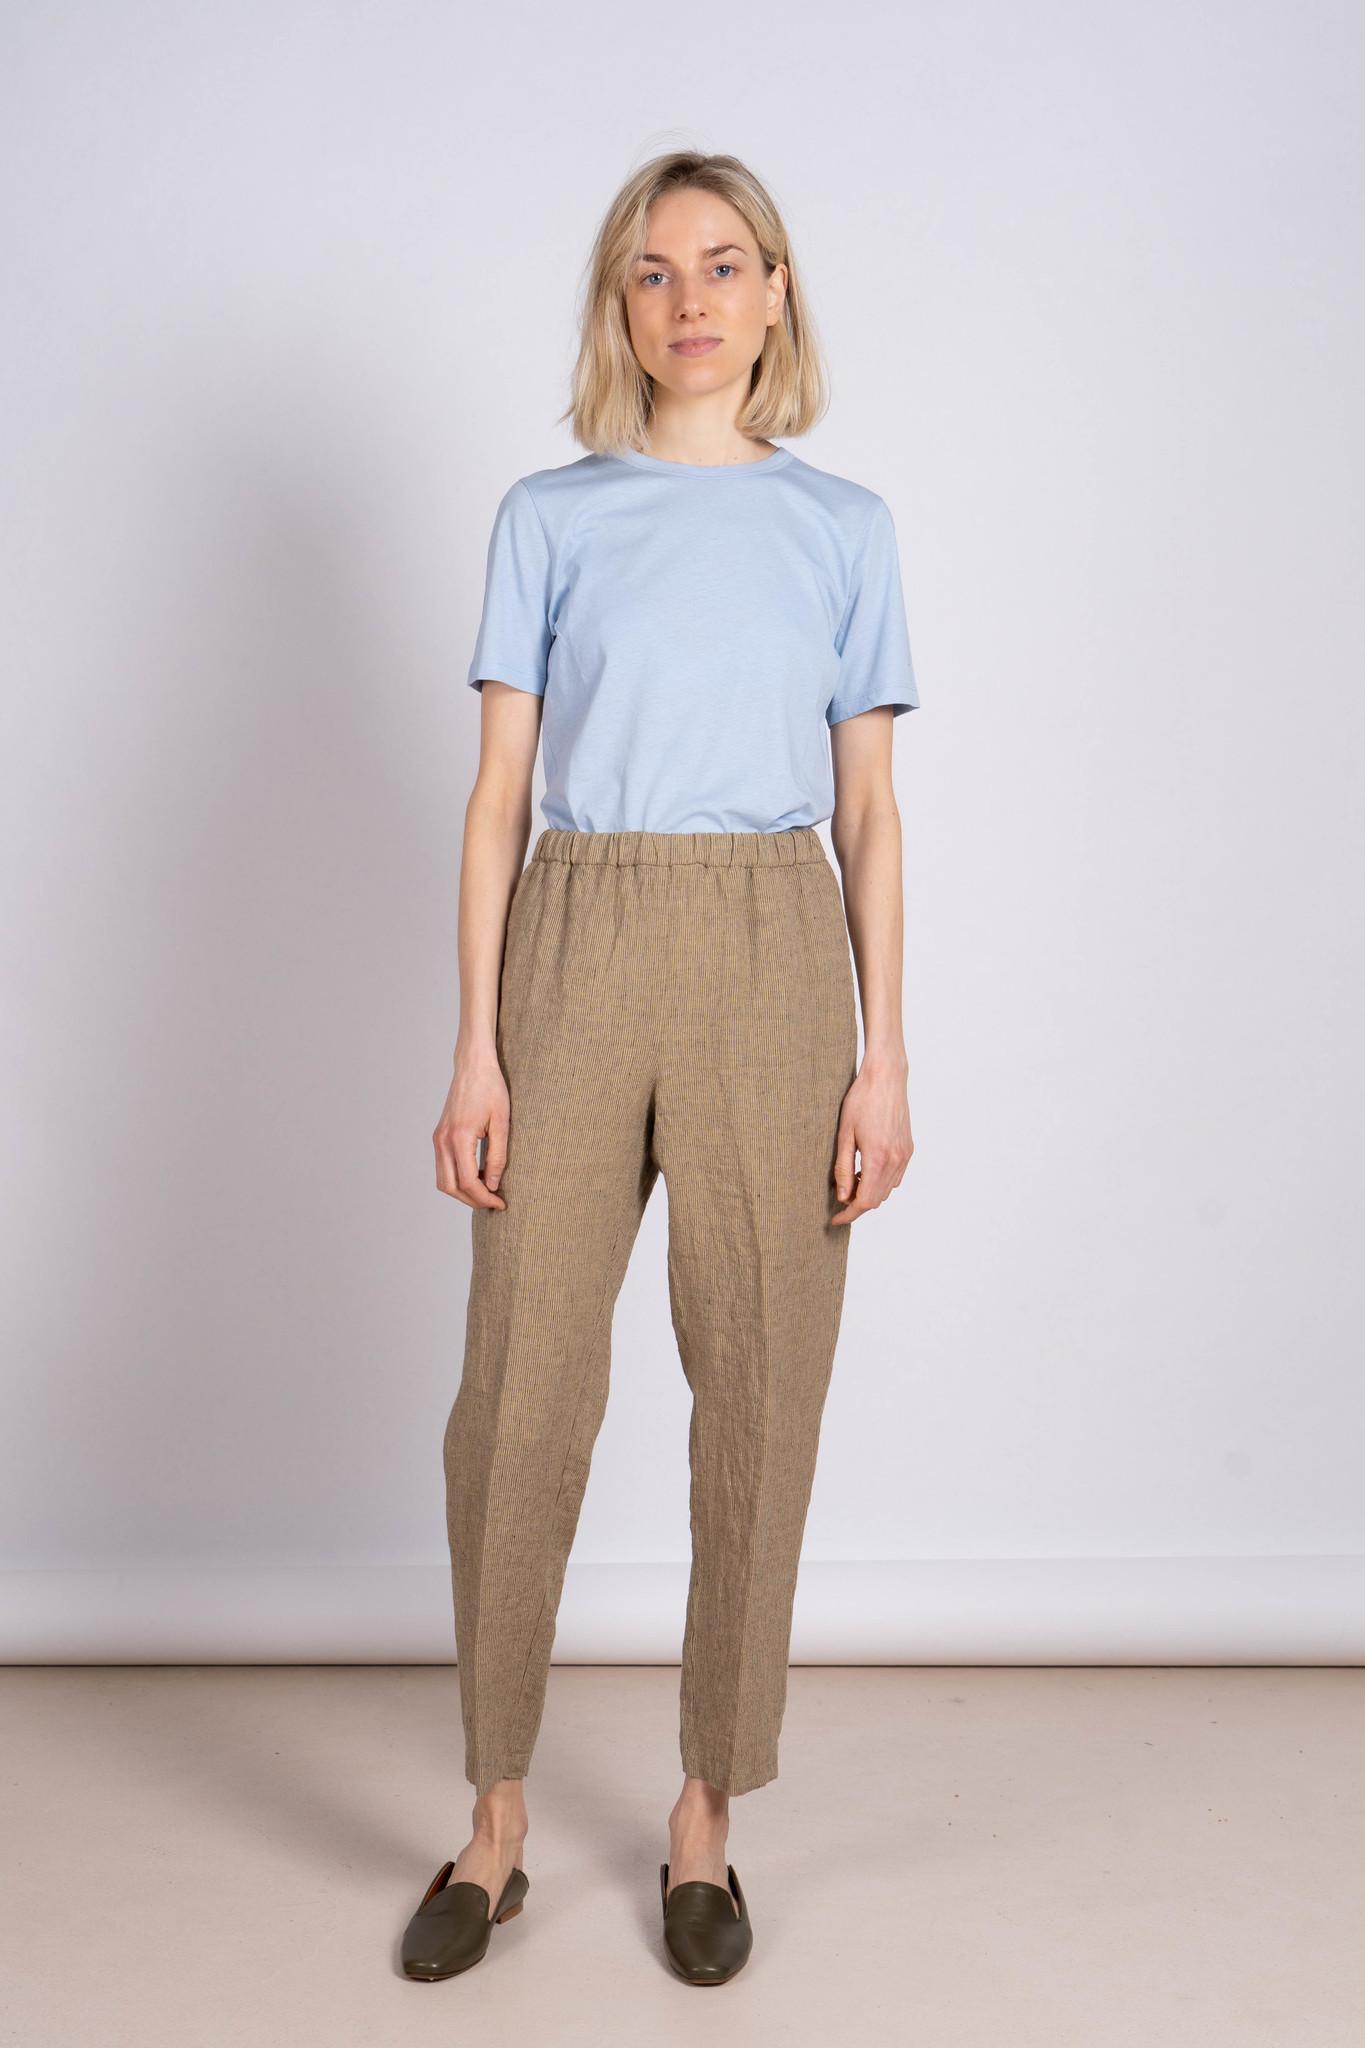 Elastic Pantalon Linen Mustard Stripe